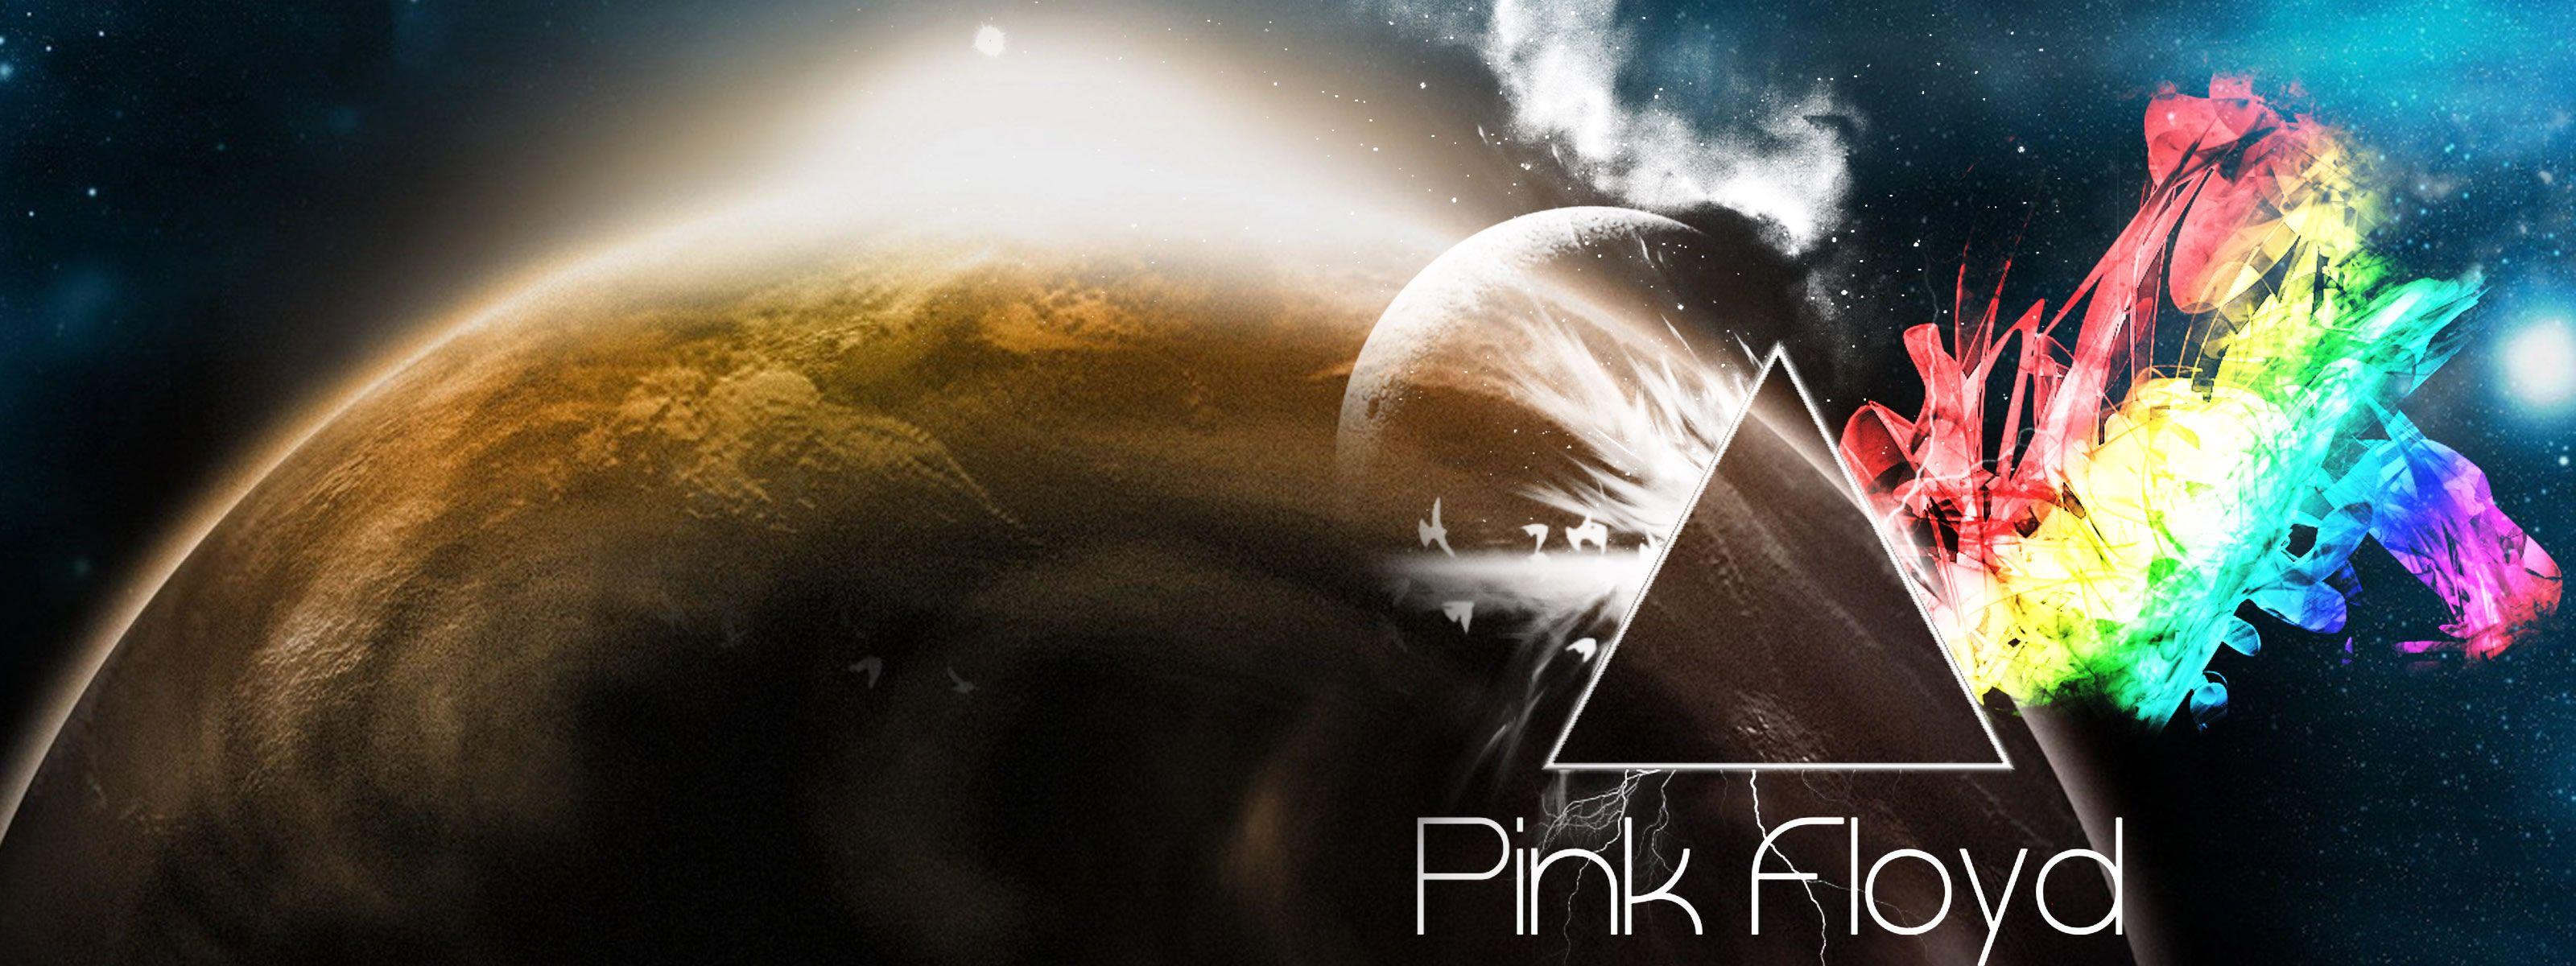 Google themes pink floyd - Pink Floyd Art Google S Gning